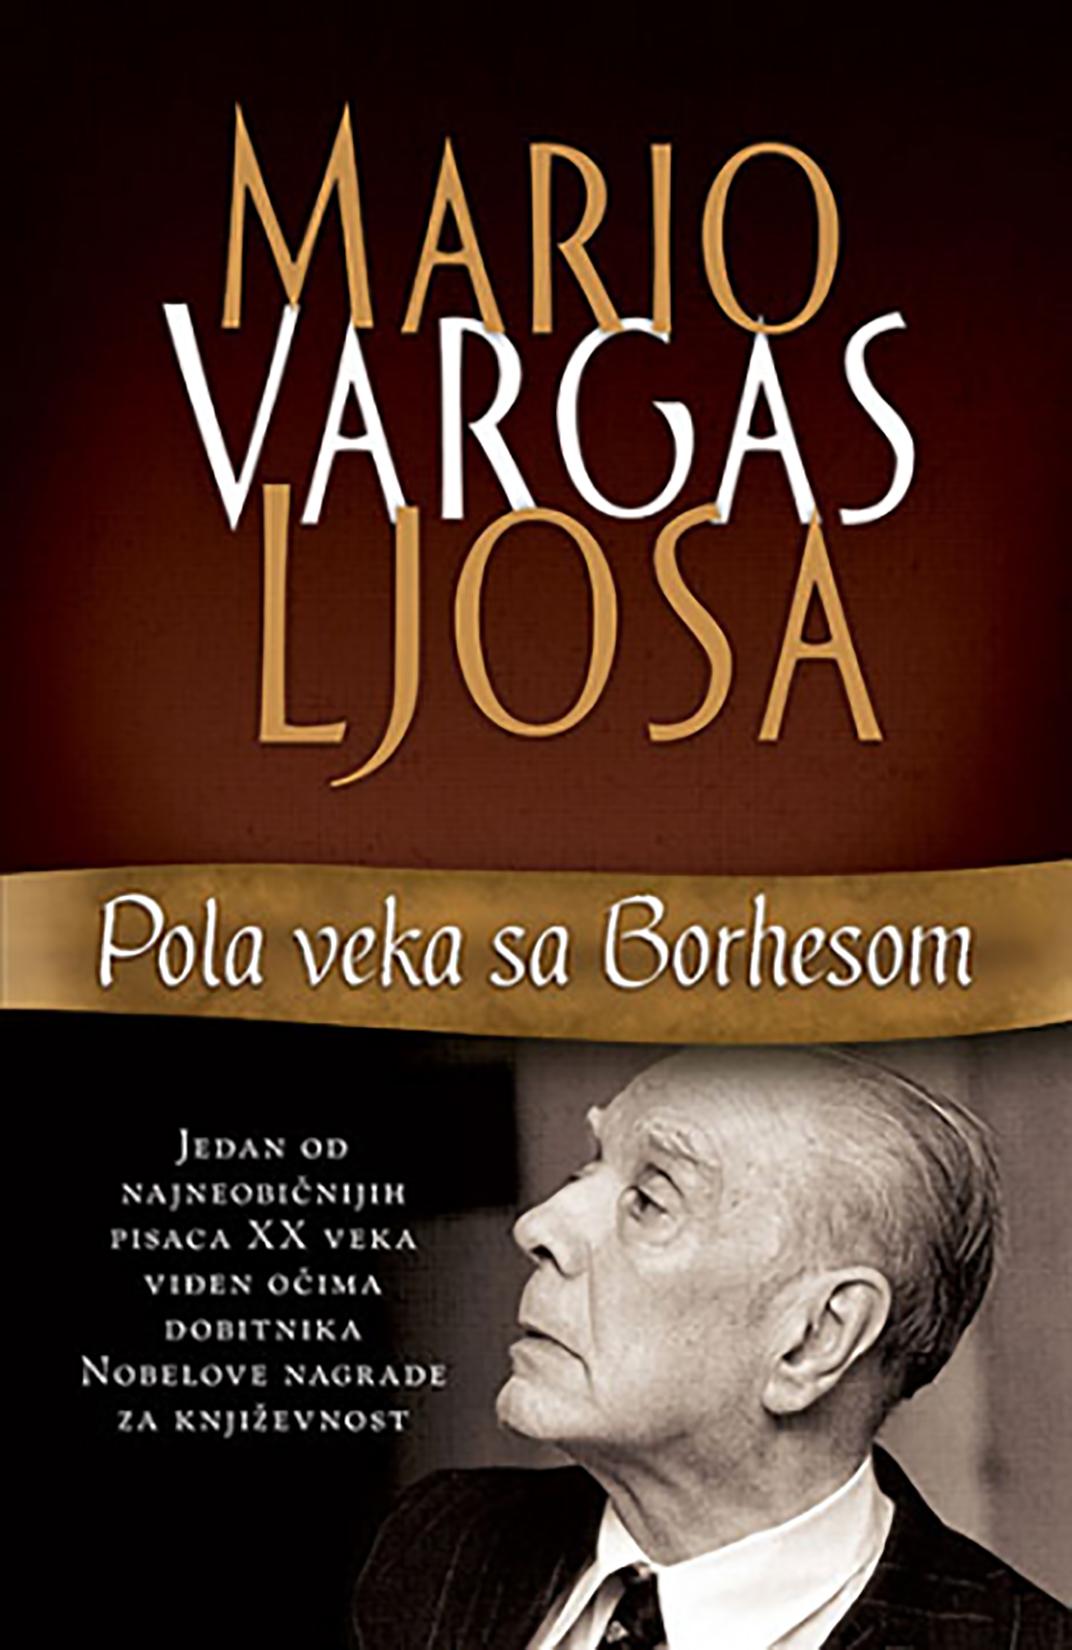 Mario Vargas Ljosa, Pola veka sa Borhesom, knjiga, knjige